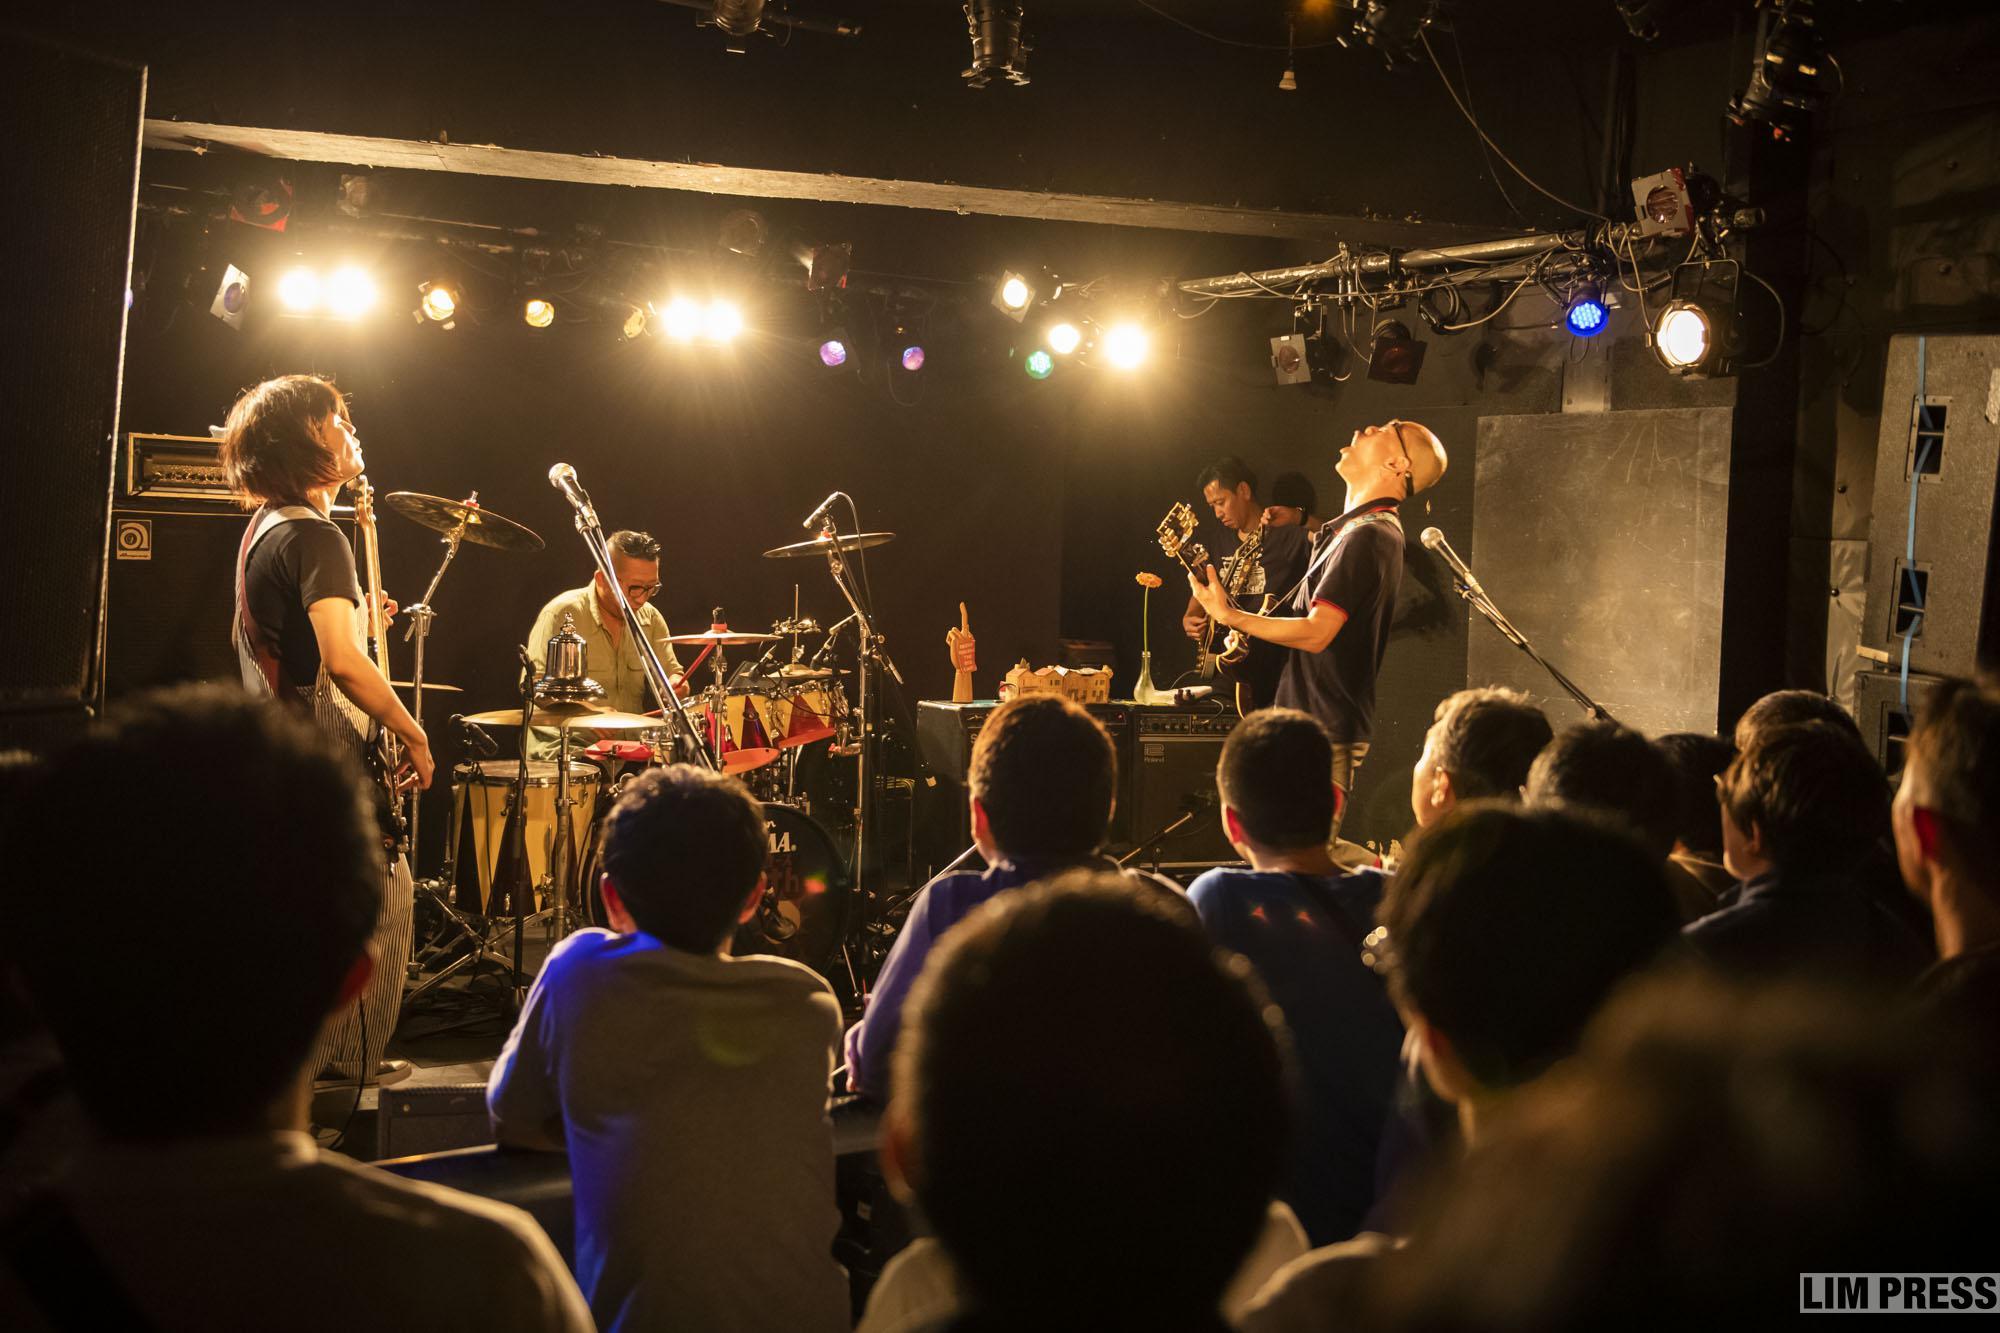 eastern youth  | 長野 LIVE HOUSE J | 2018.11.04